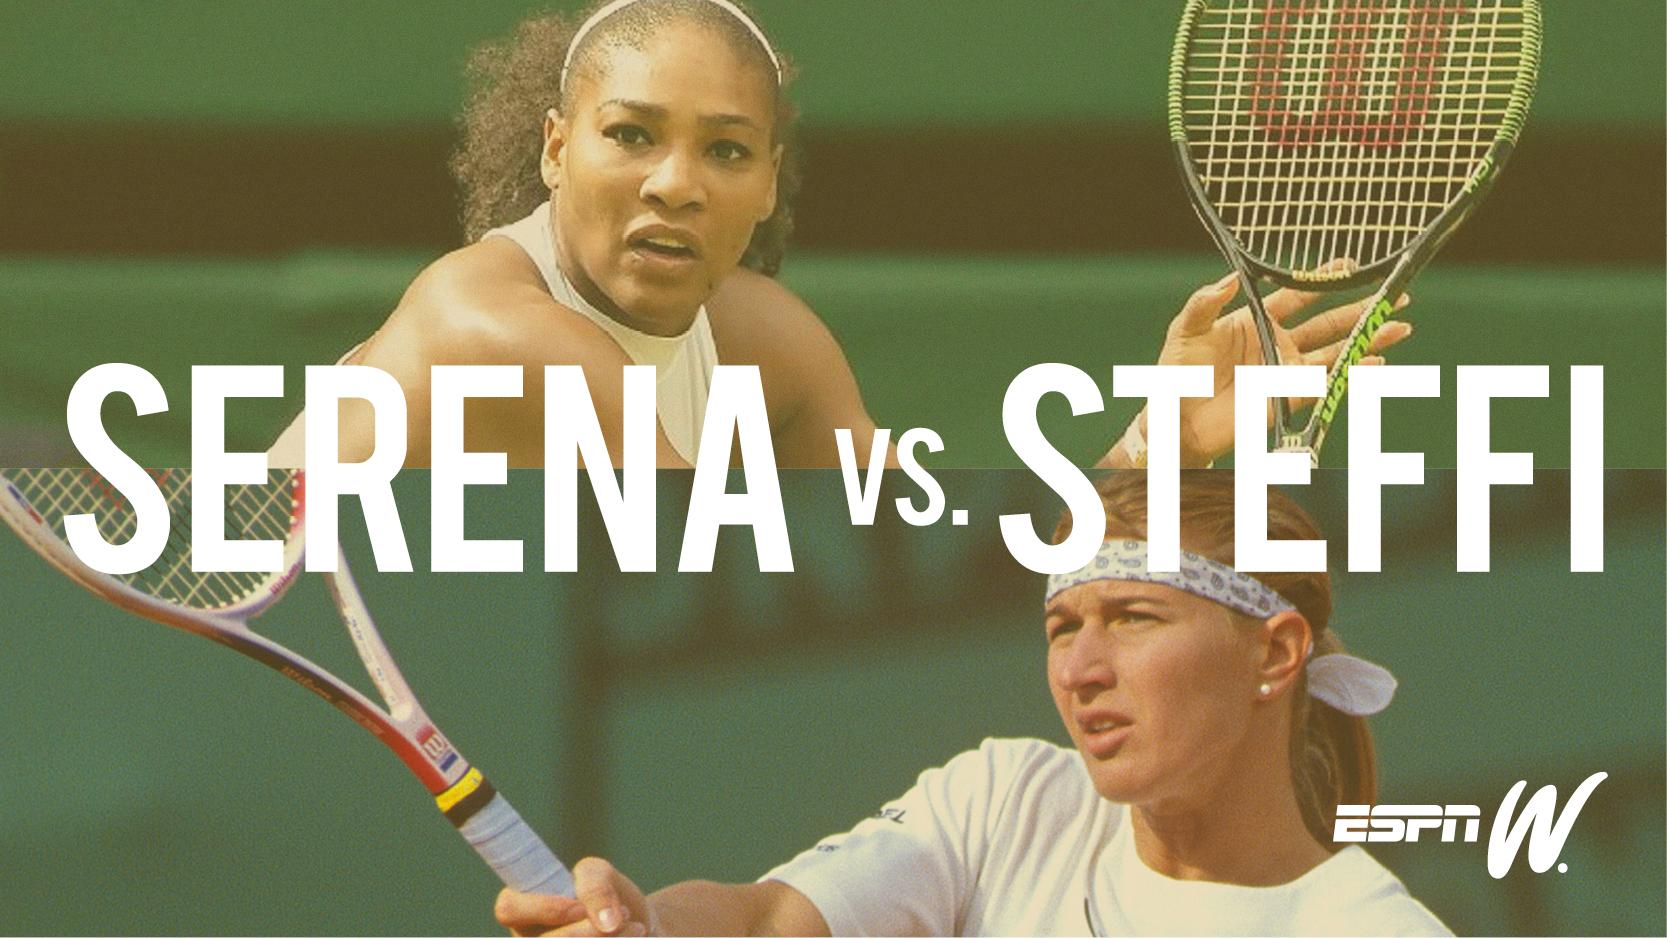 Serena vs steffi infographic MEM